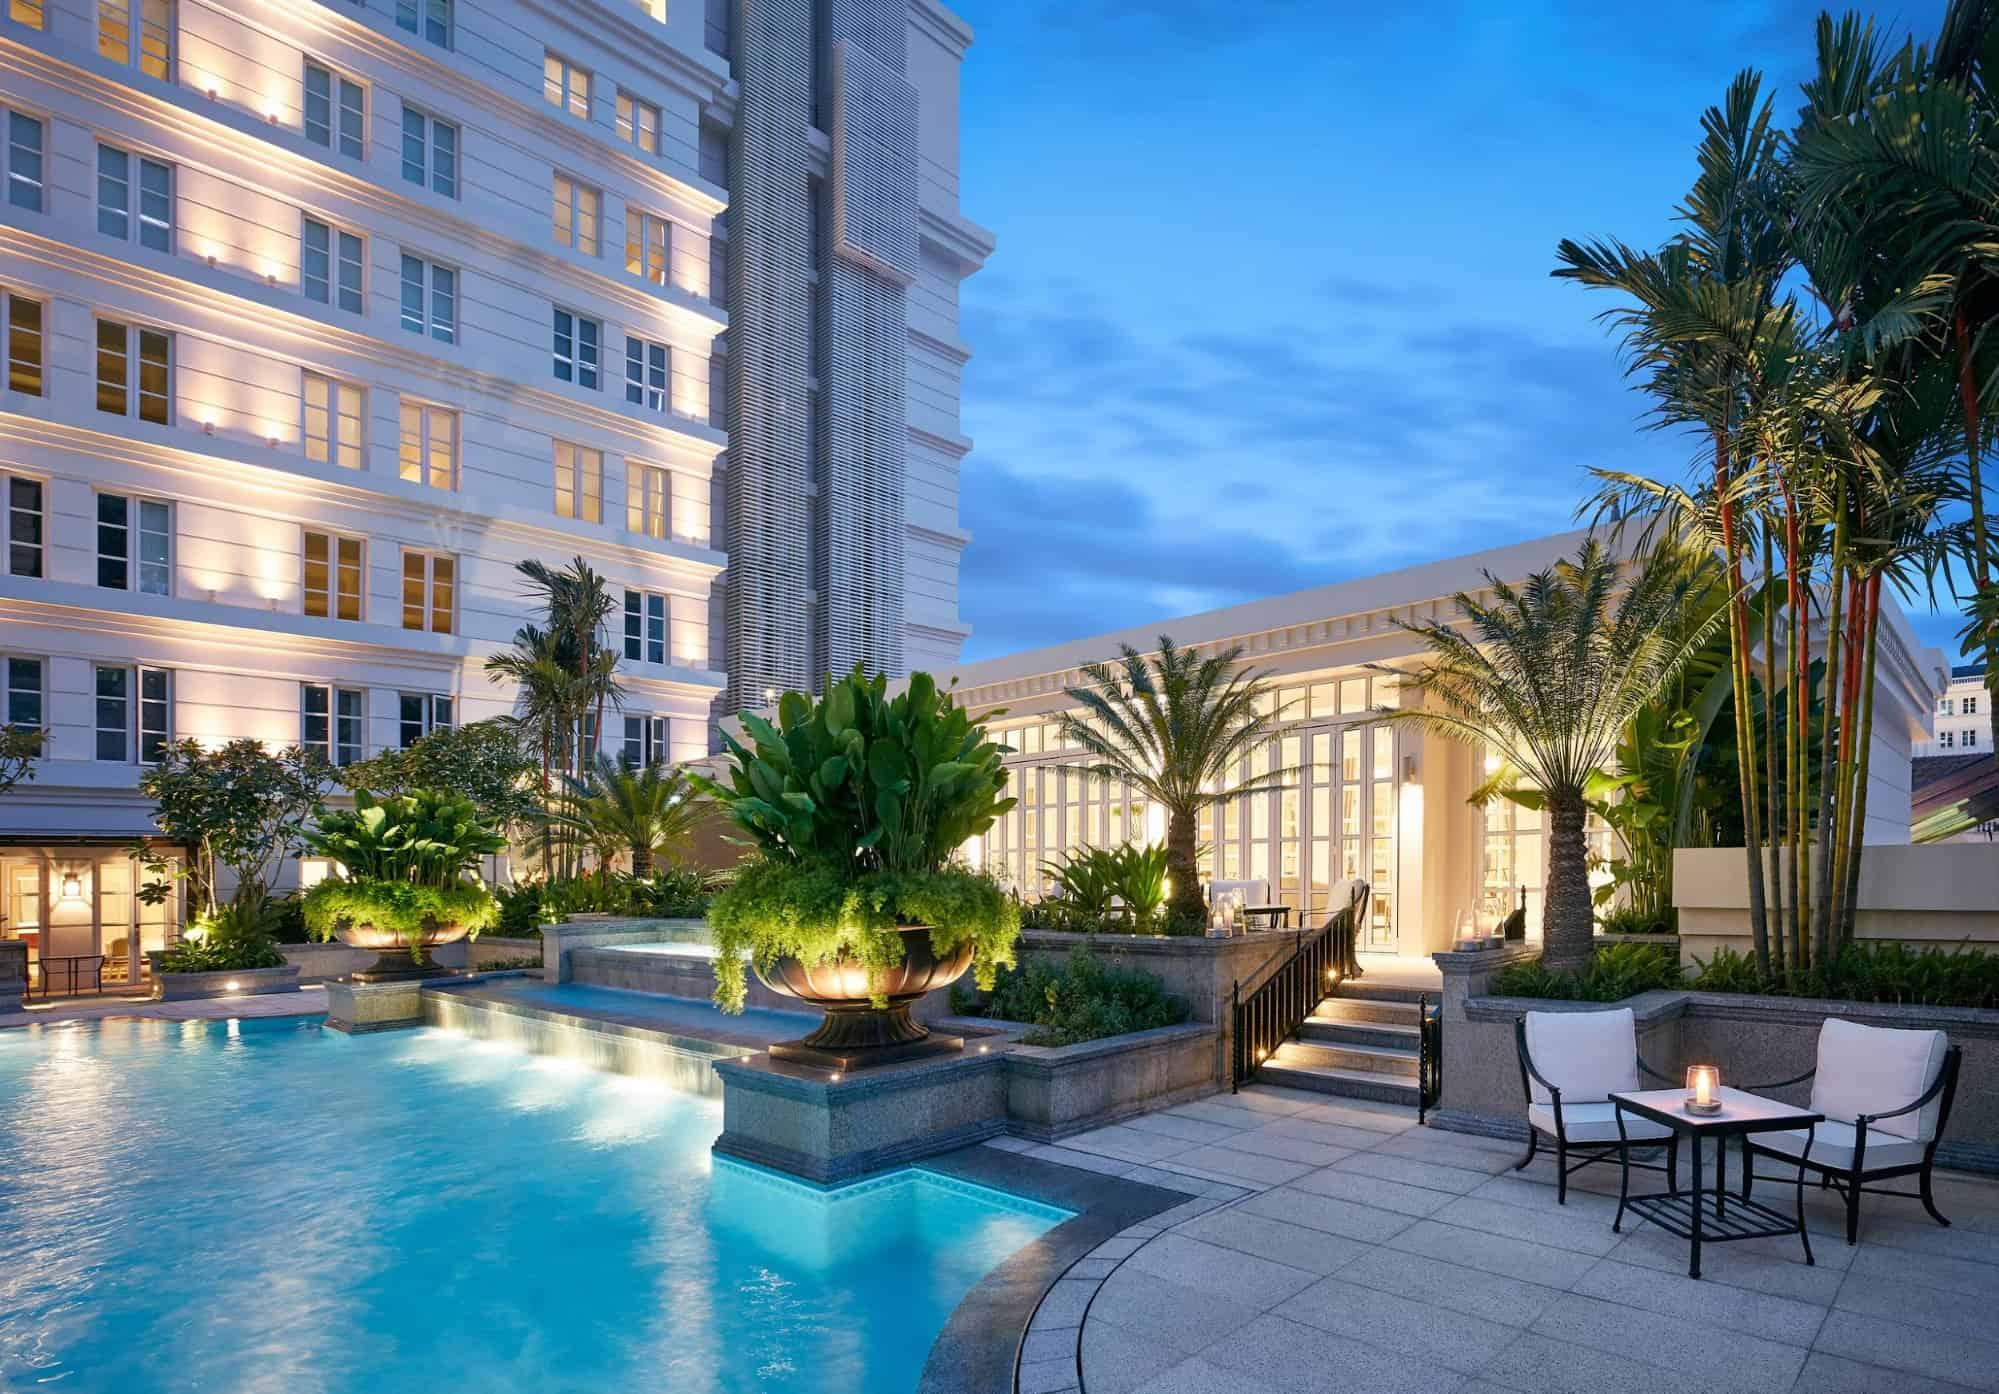 best hyatt hotels in the world for free nights-Park Hyatt Saigon-Vietnam